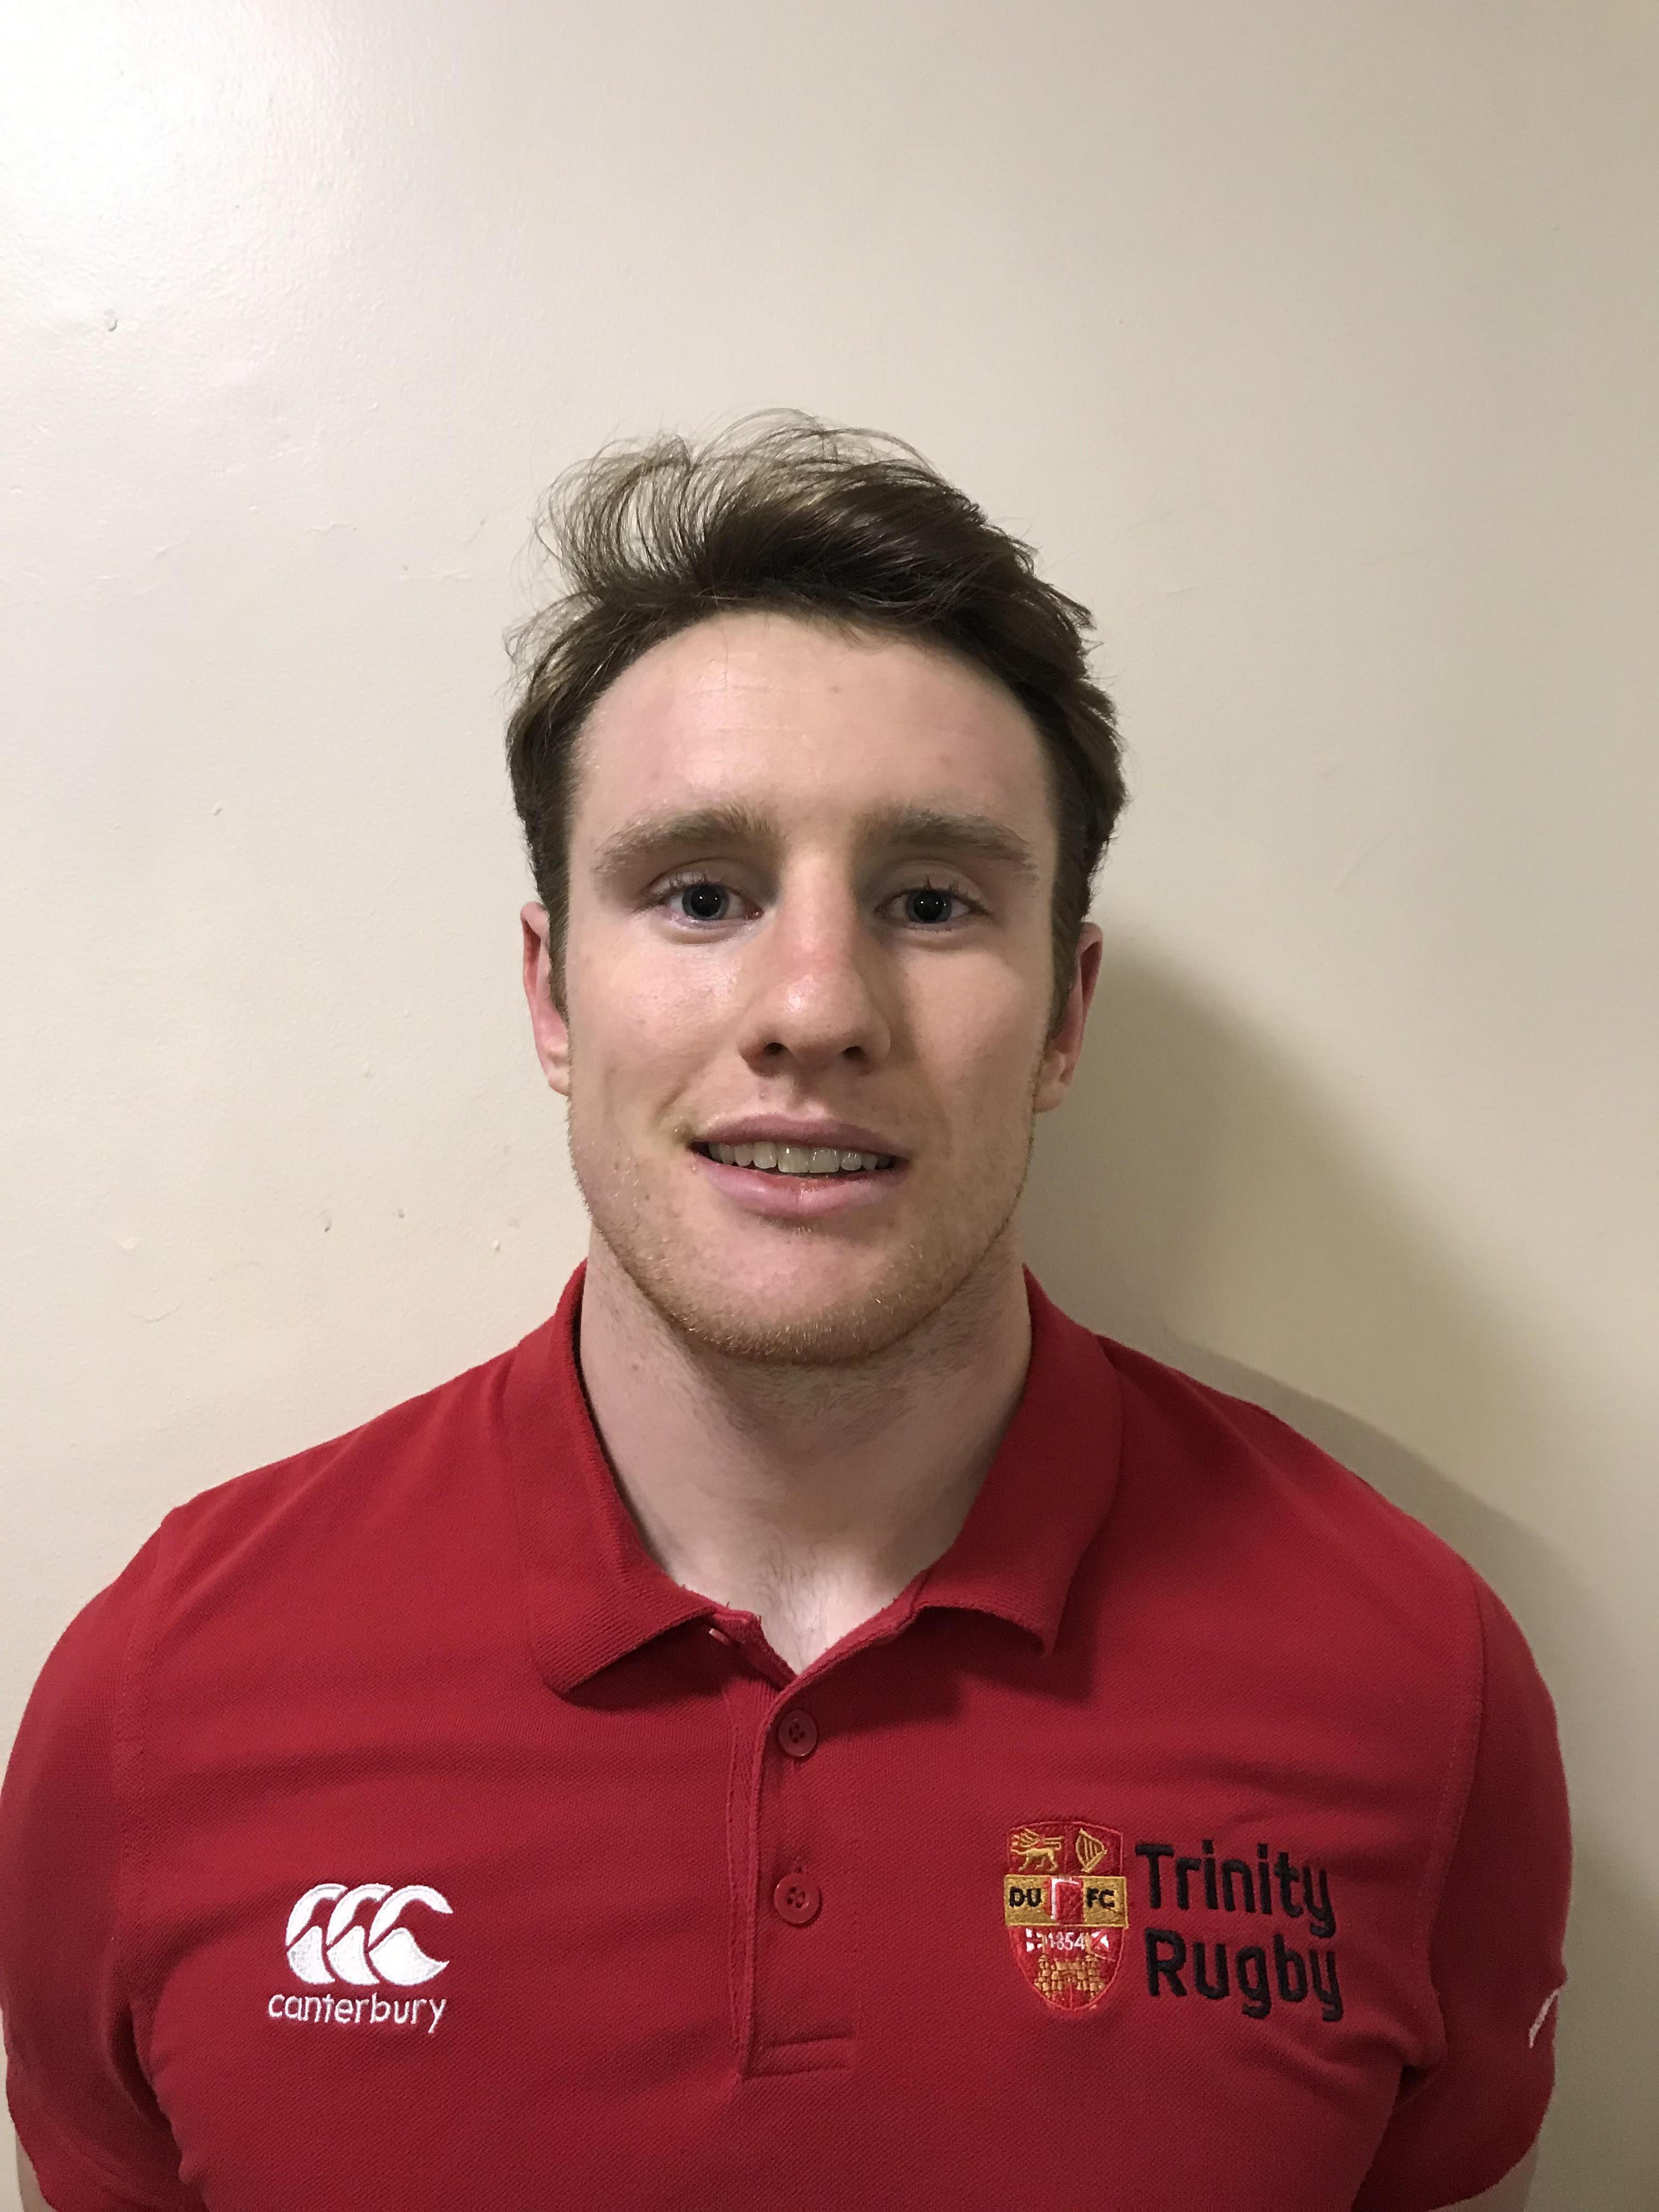 McKeown - Dublin University Football Club - Trinity Rugby